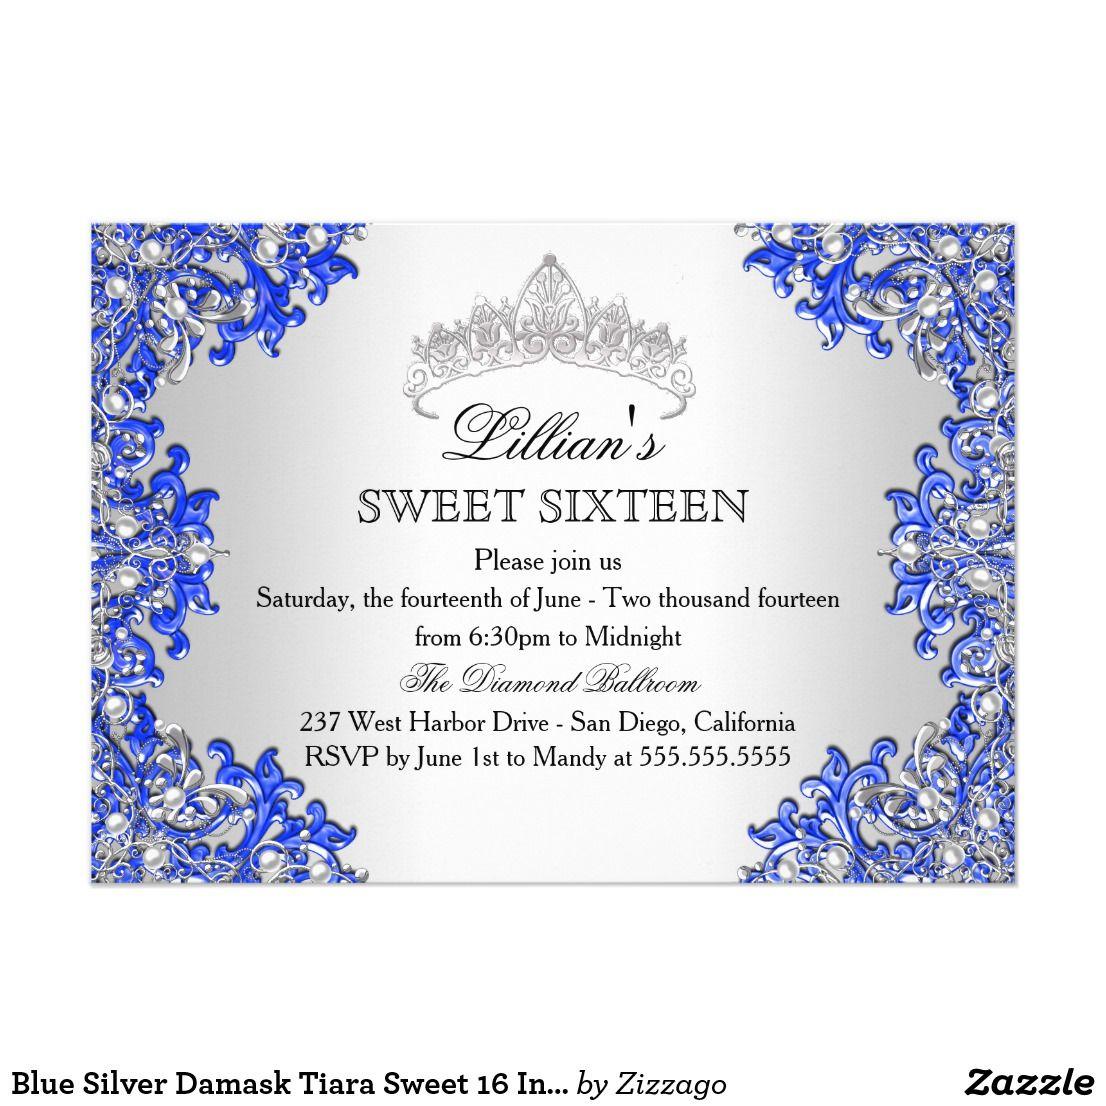 Blue Silver Damask Tiara Sweet 16 Invitation Blue & Silver Sweet 16 ...